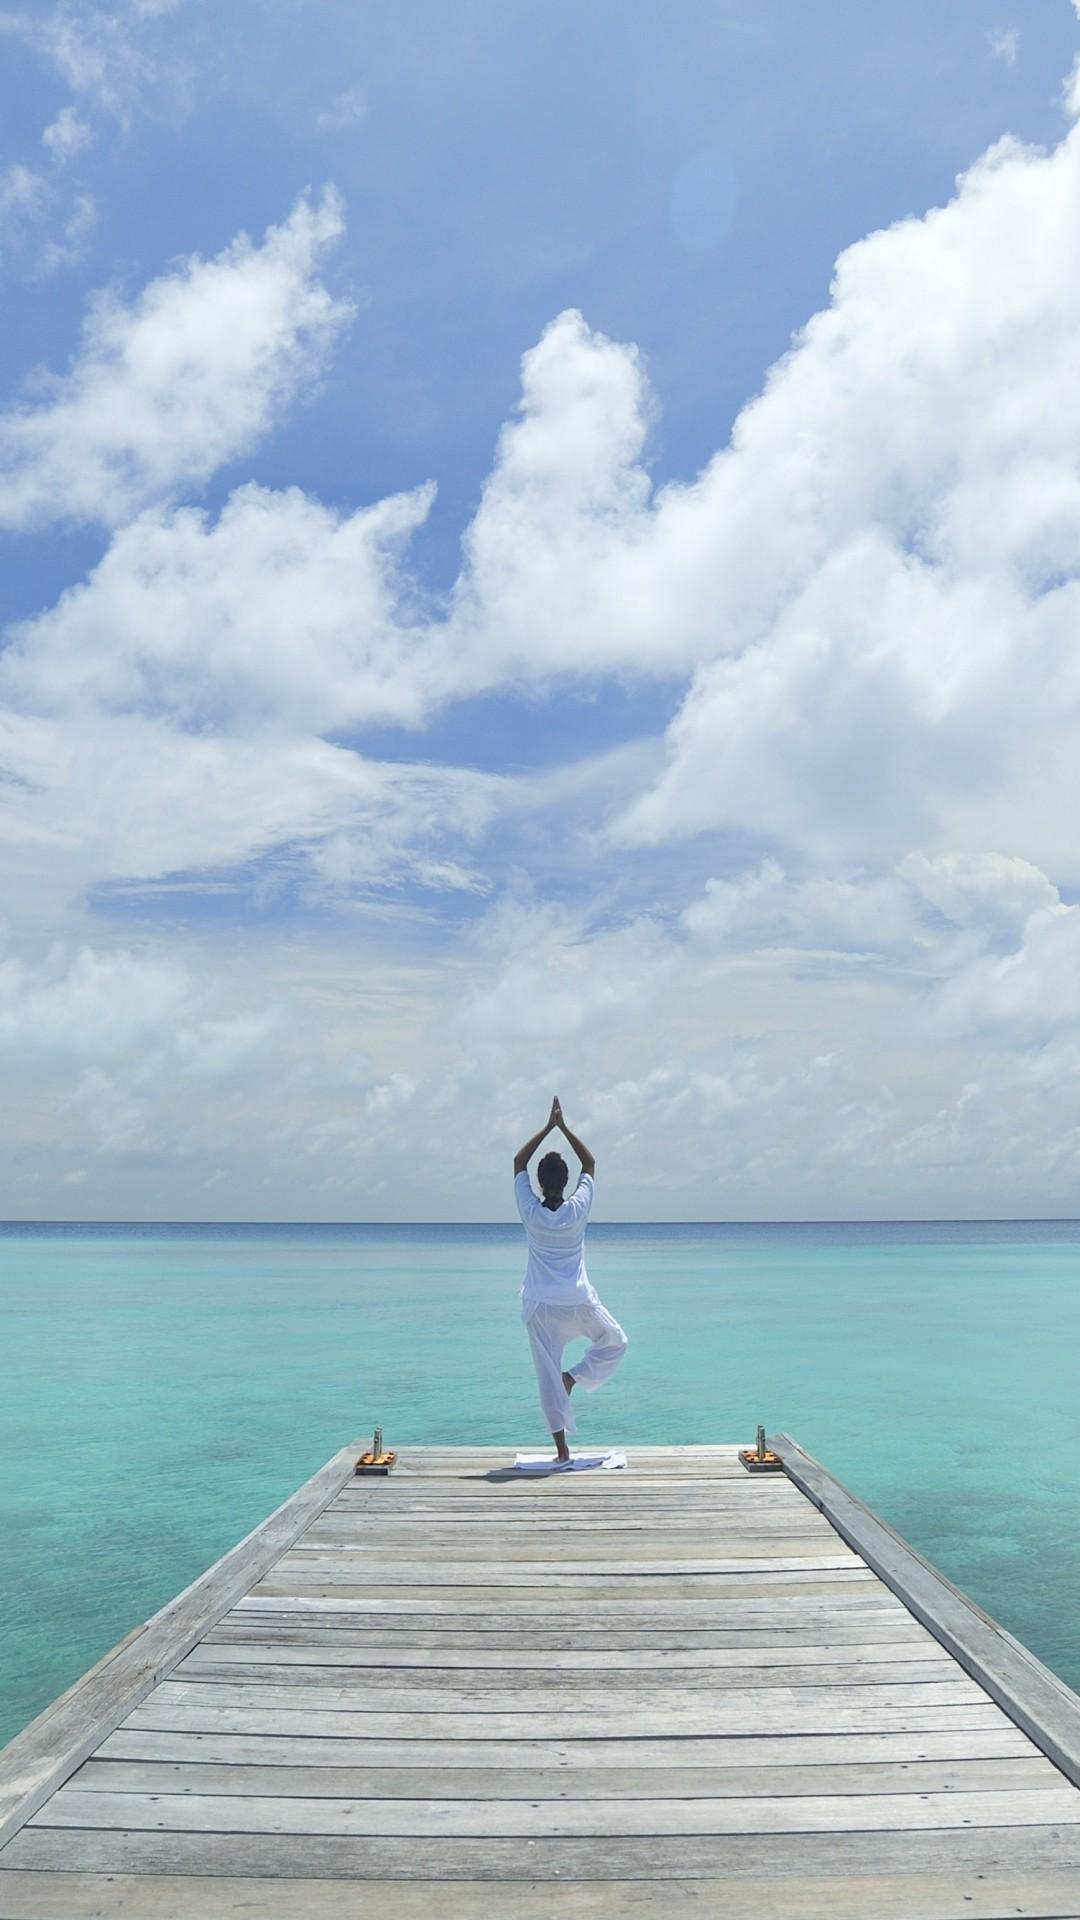 Wallpaper Yoga Beach Sea Blue Sky Sport 10413